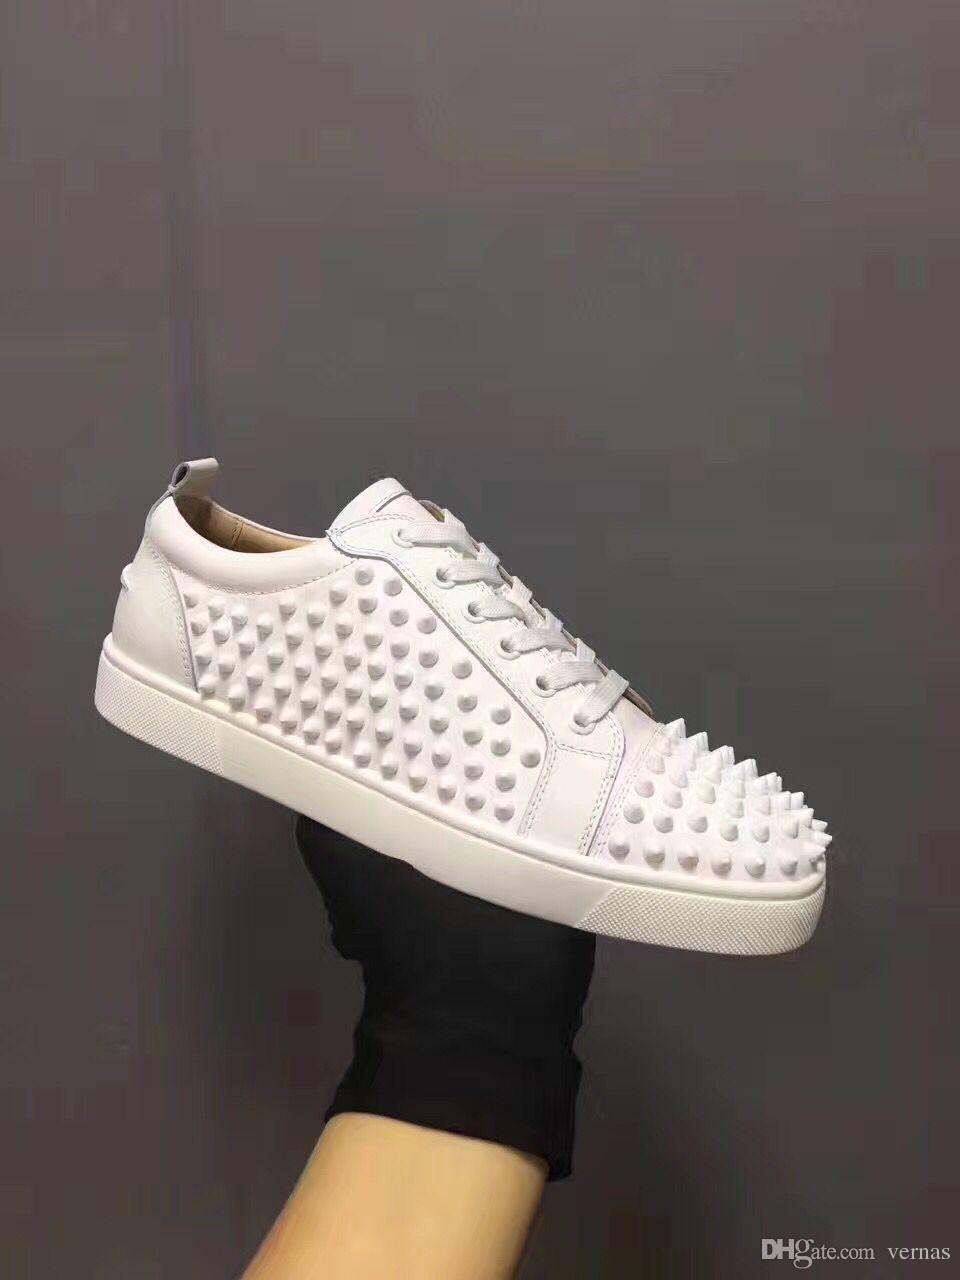 Chaussures - Bas-tops Et Baskets Rouges (v) vIoVQH